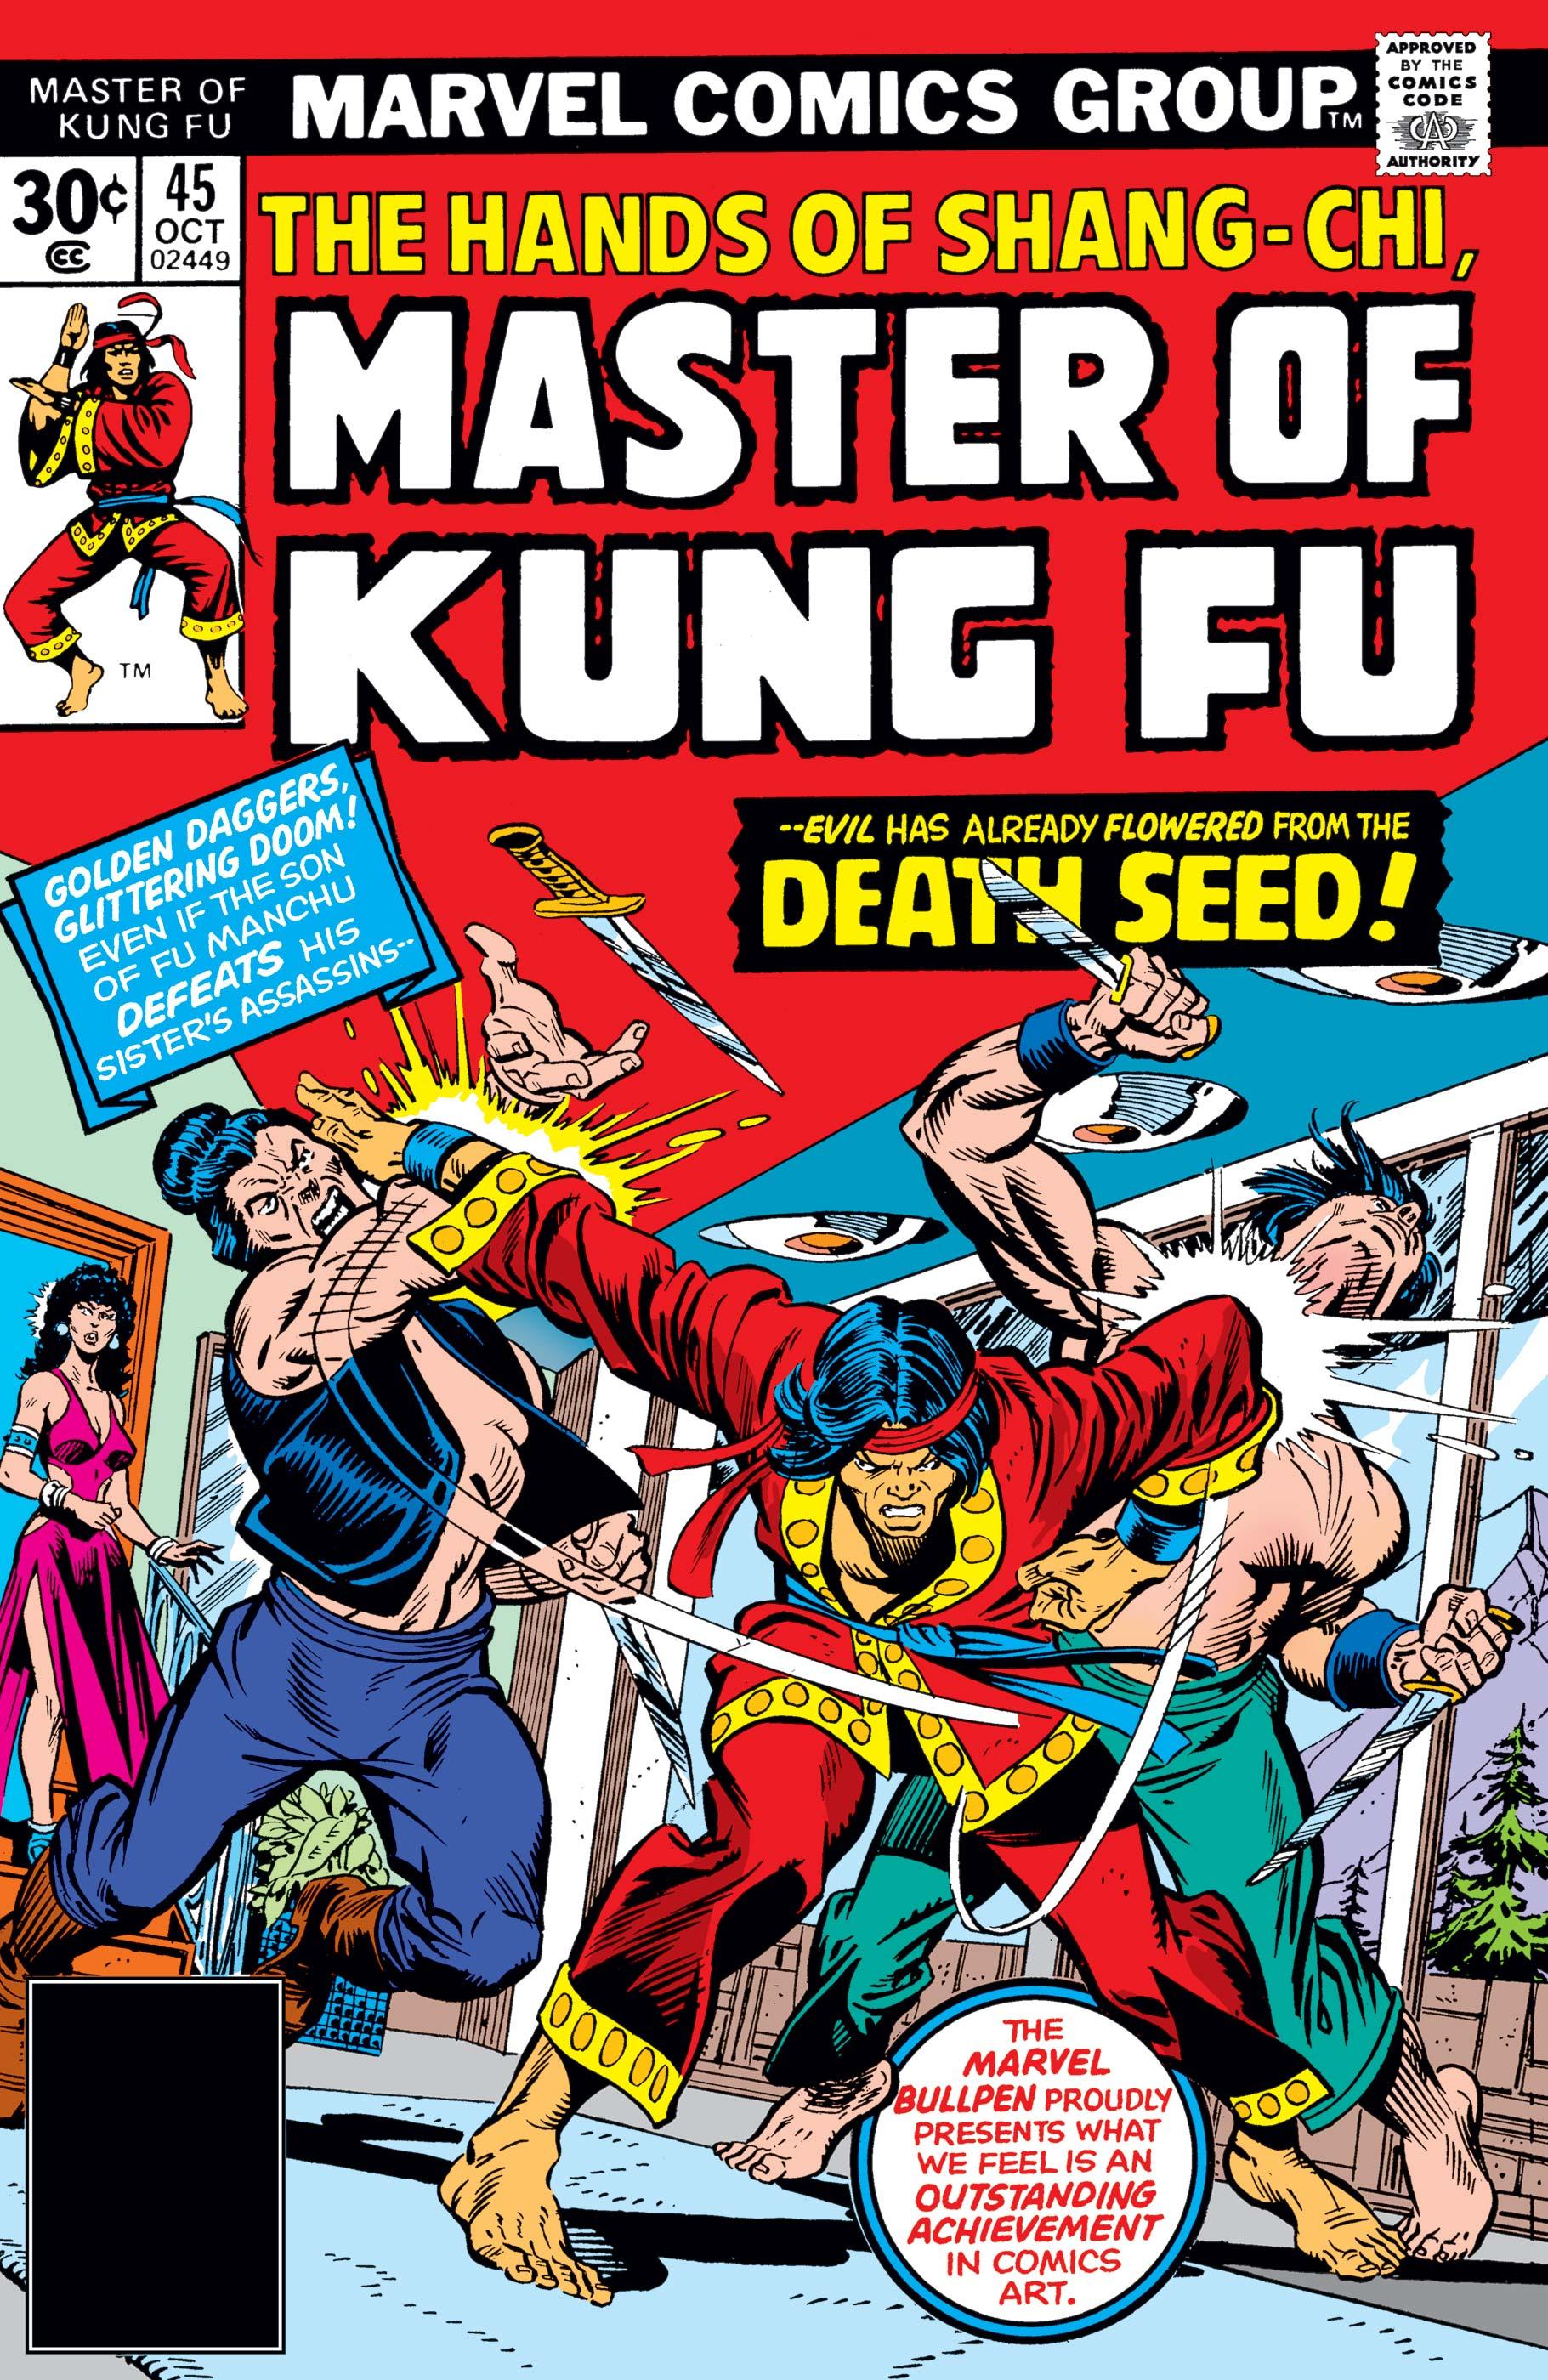 Master of Kung Fu (1974) #45